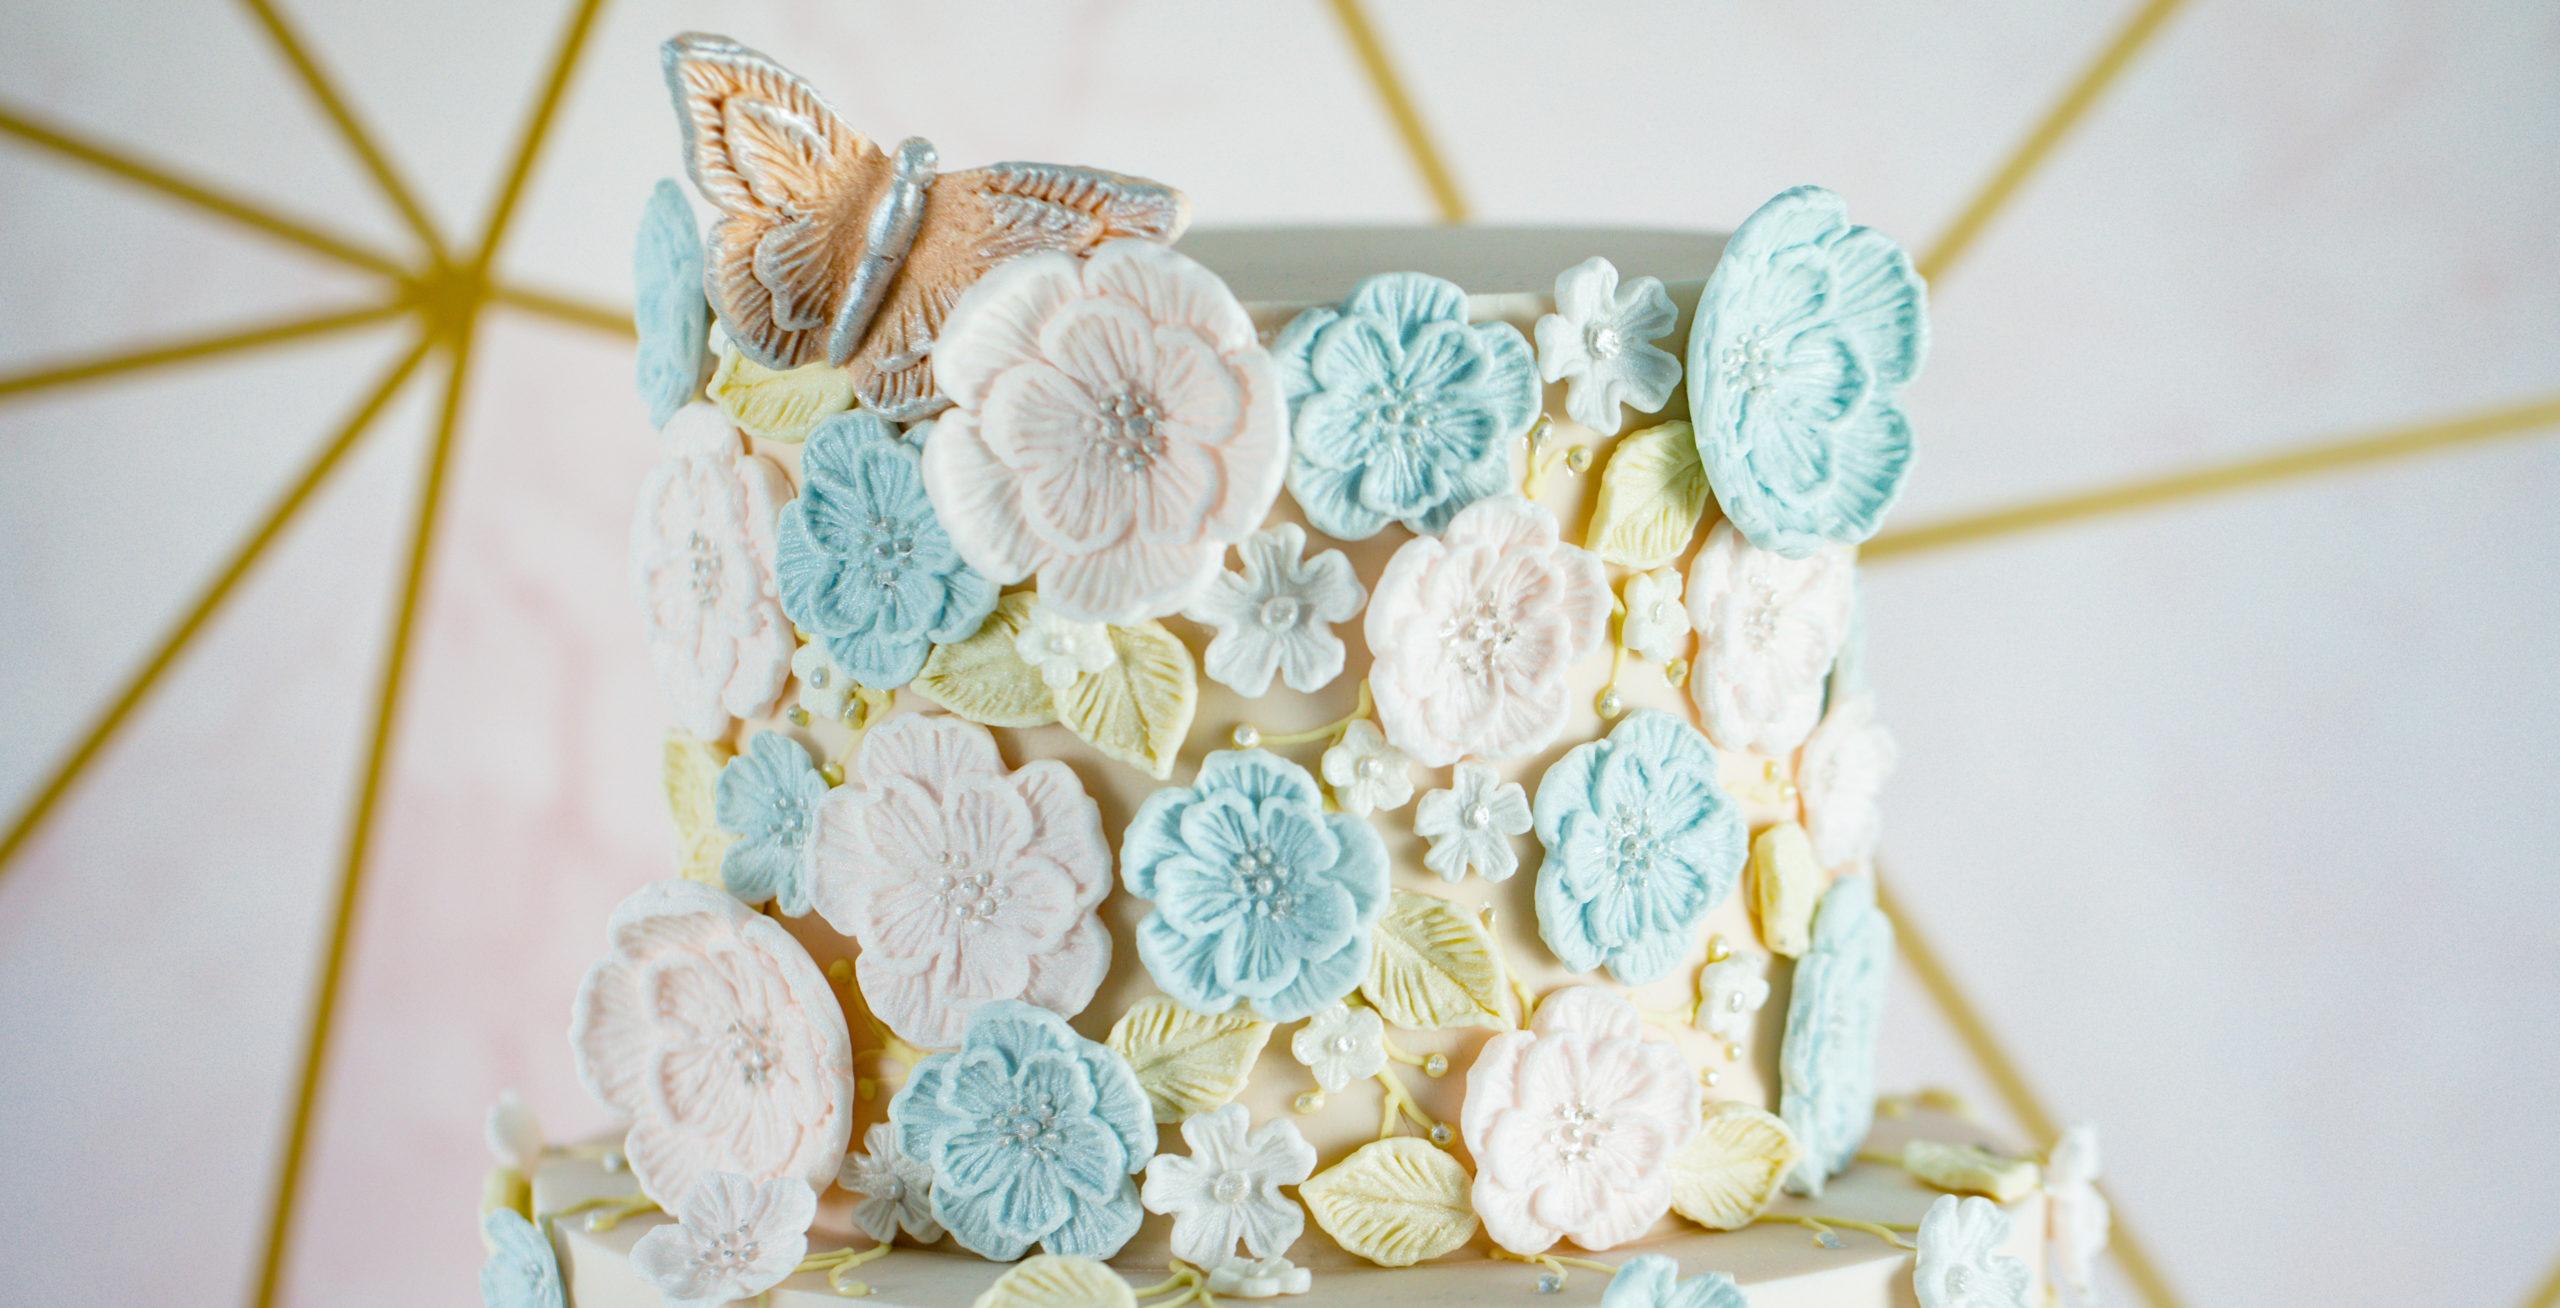 Bow JUNGEN Bow Silicone Fondant Mould Cake Decorating Chocolate Baking Mold Sugarcraft Tool